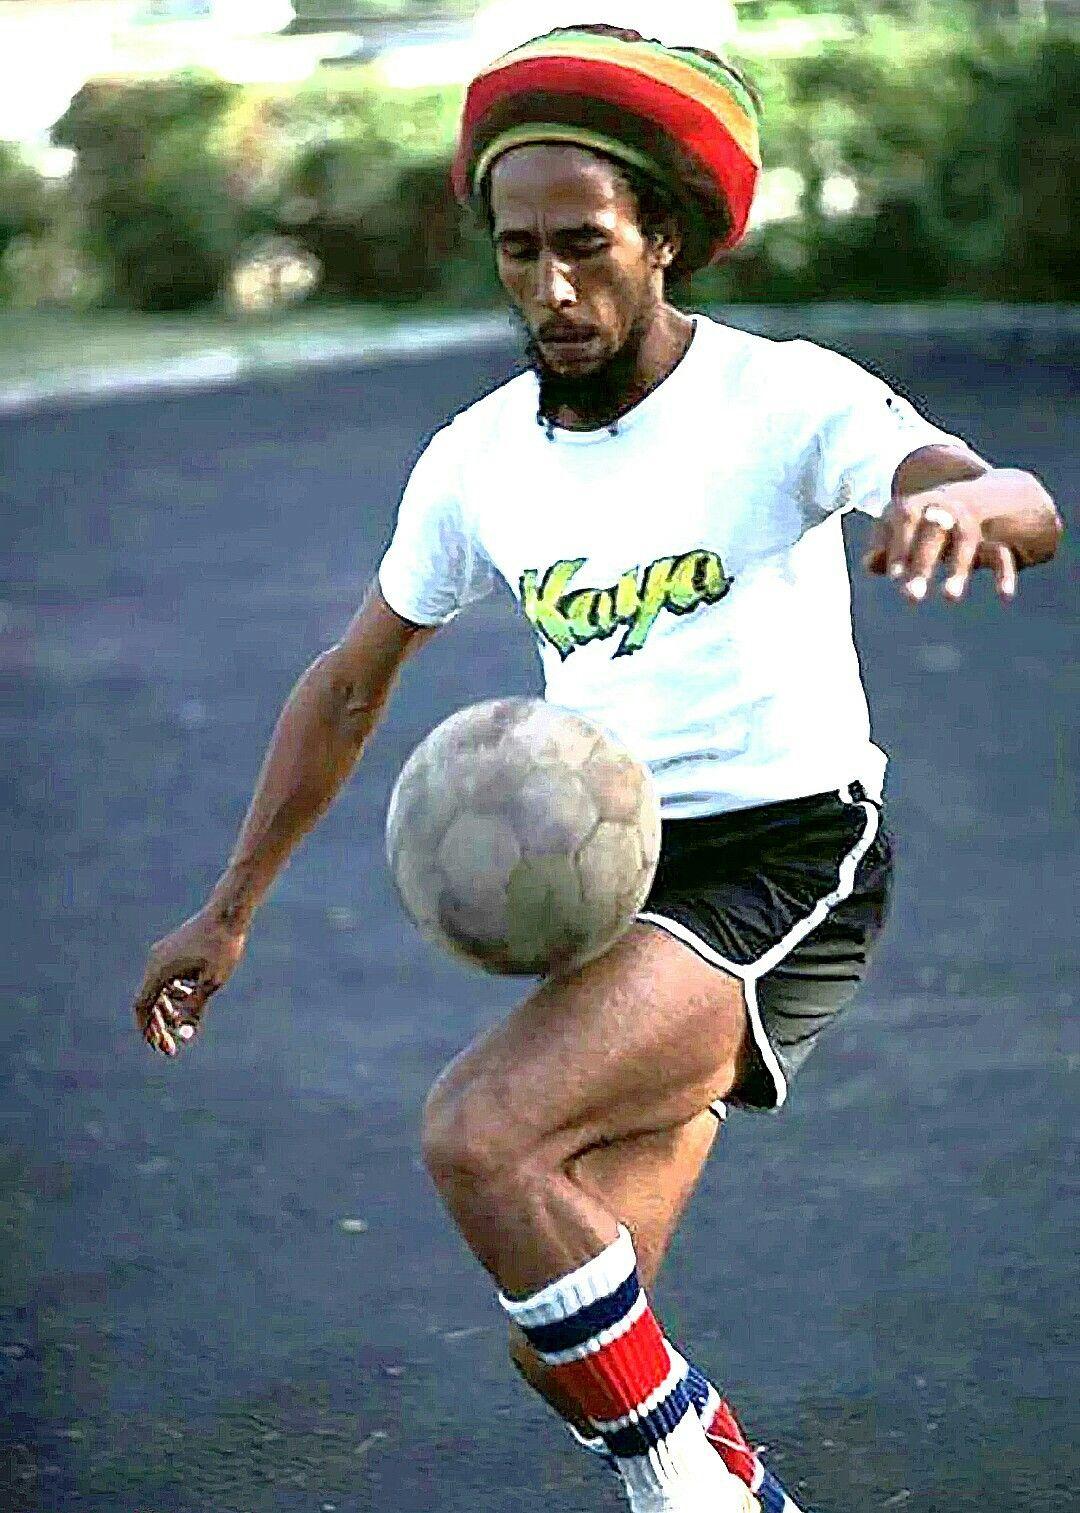 Bob Football Marley Ideas E Ilustraciones Pinterest Musica